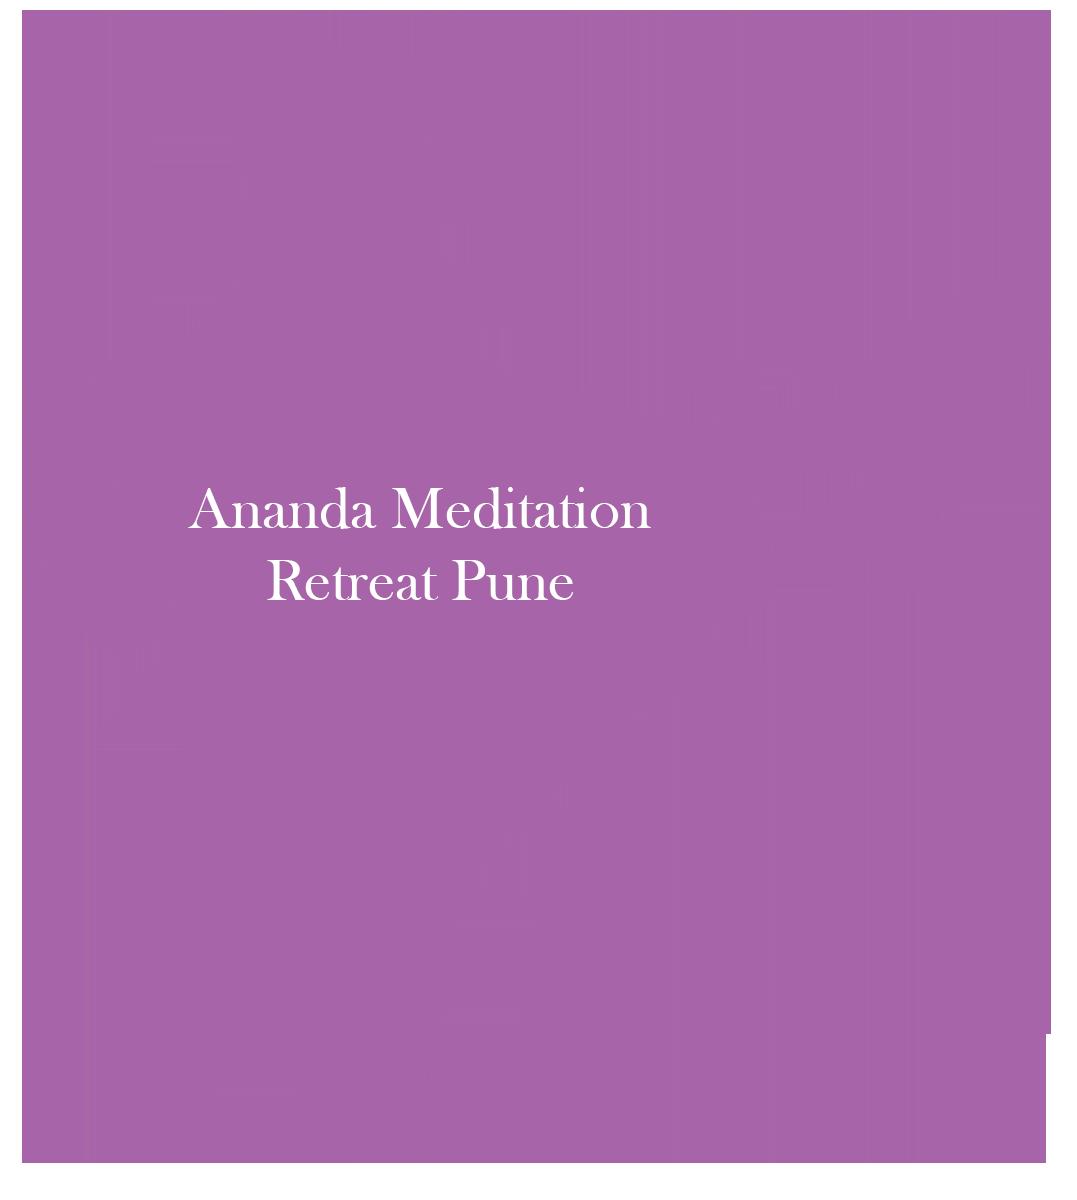 Ananda Meditation Retreat Pune